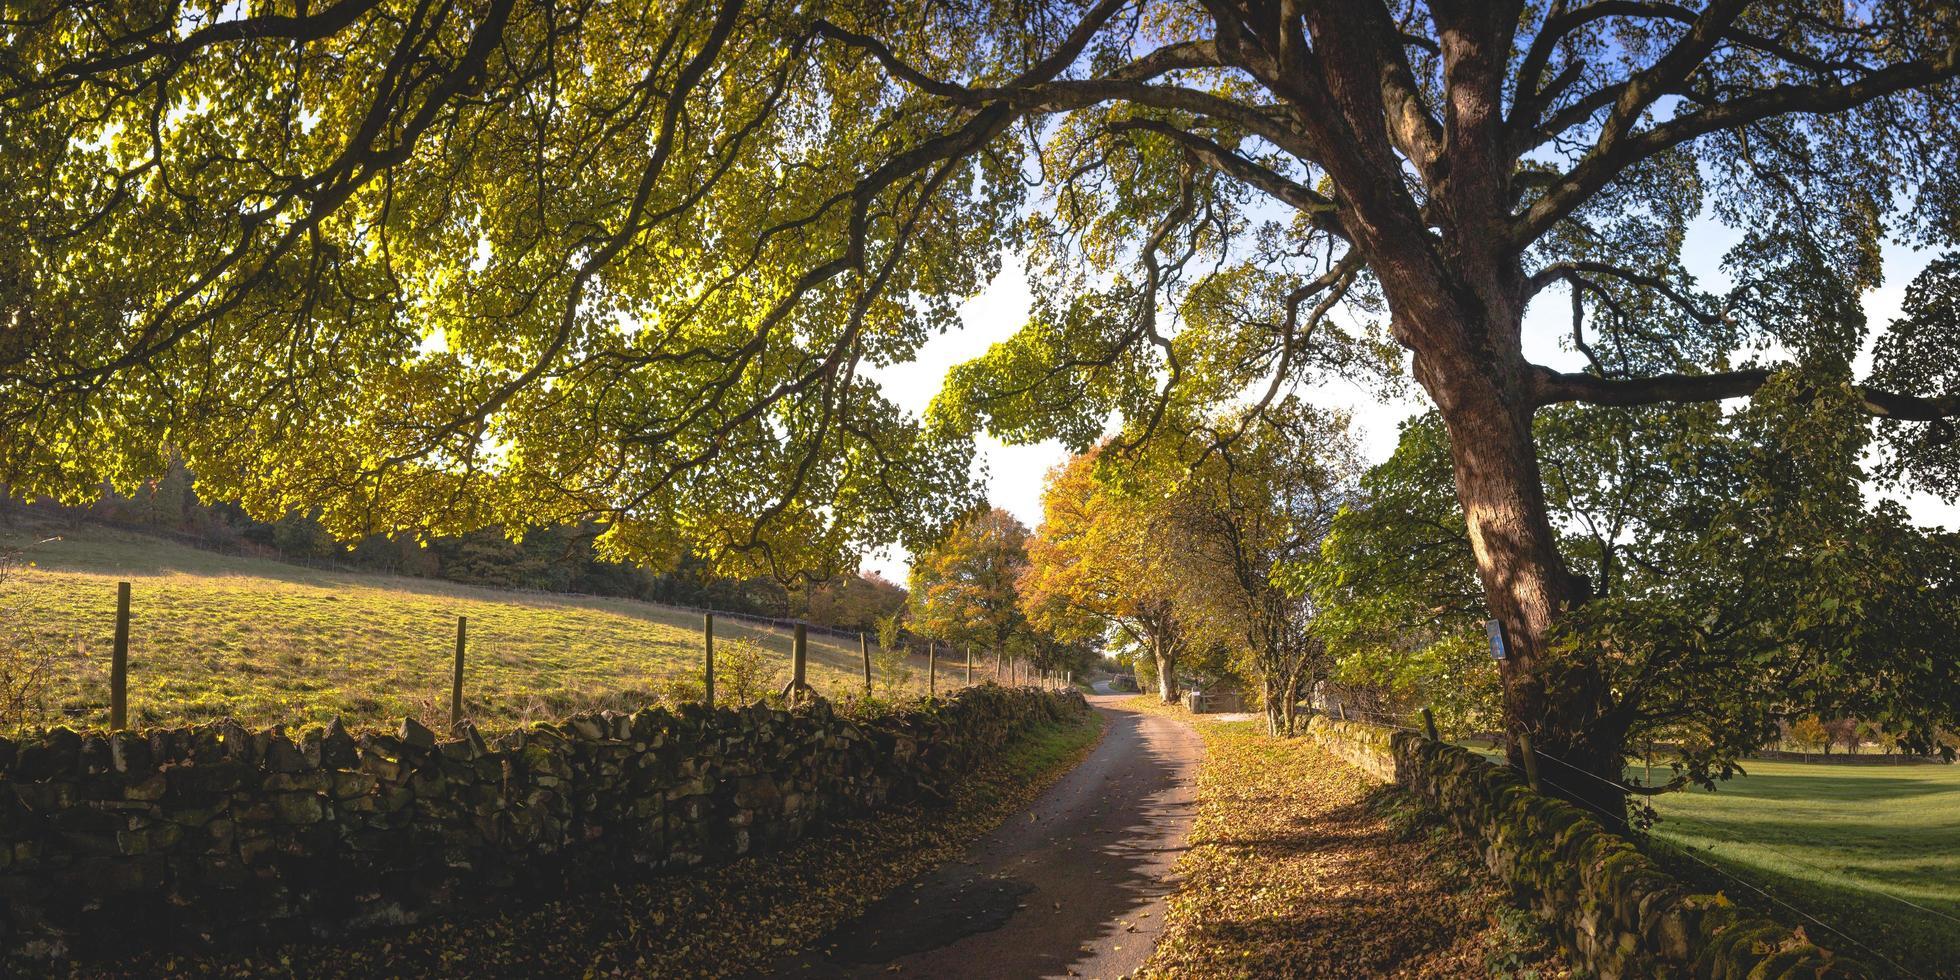 onverharde weg op het platteland foto